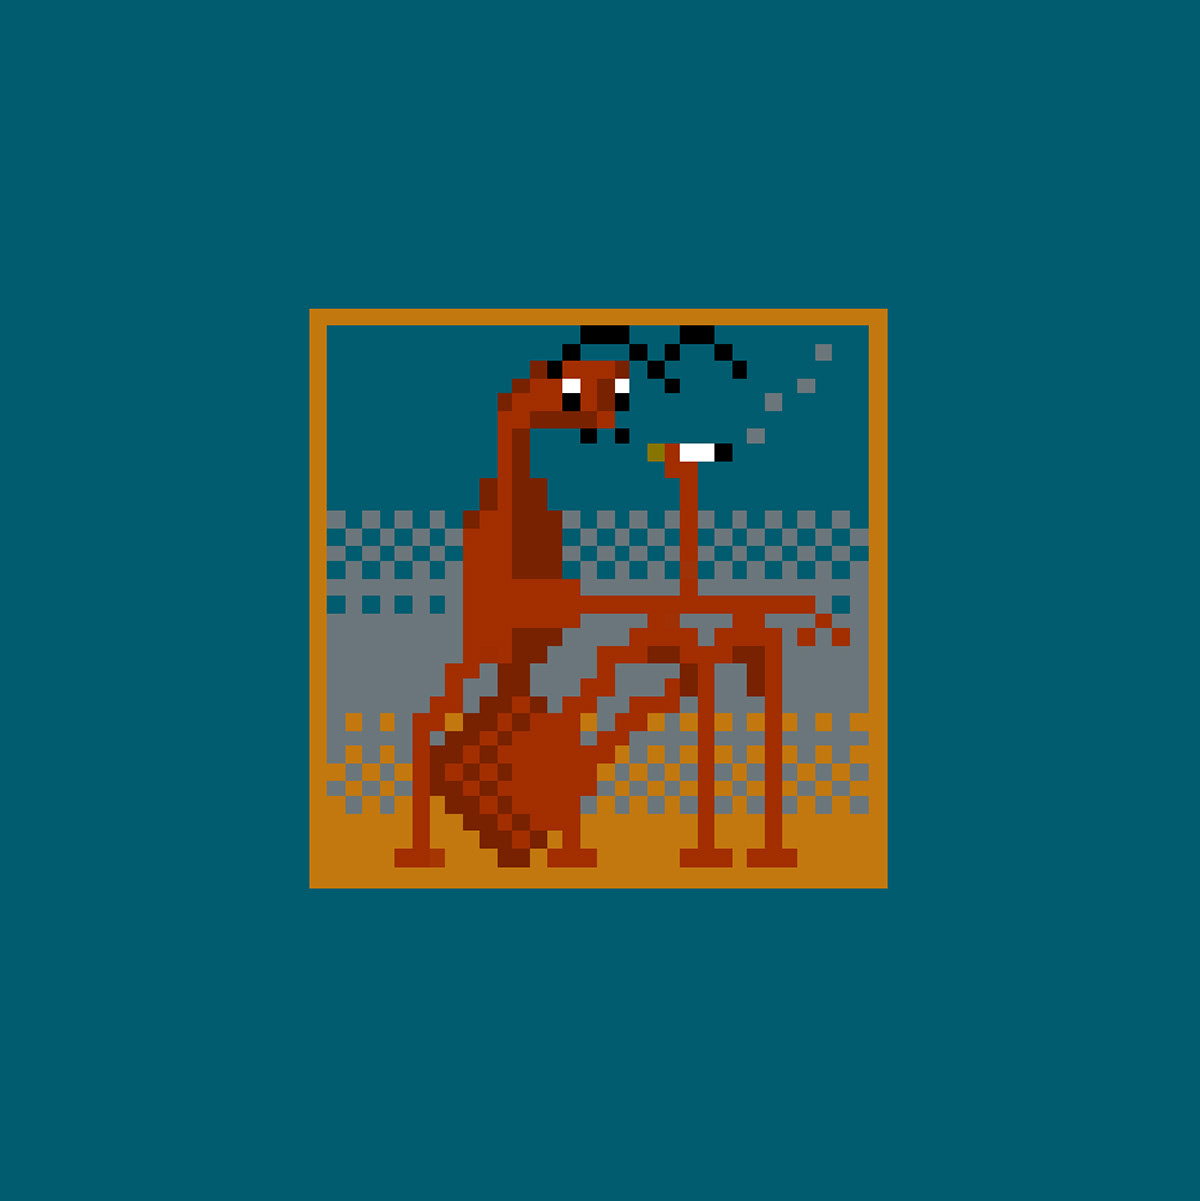 animation  art cover design draw Drawing  gif ILLUSTRATION  pixel pixelart